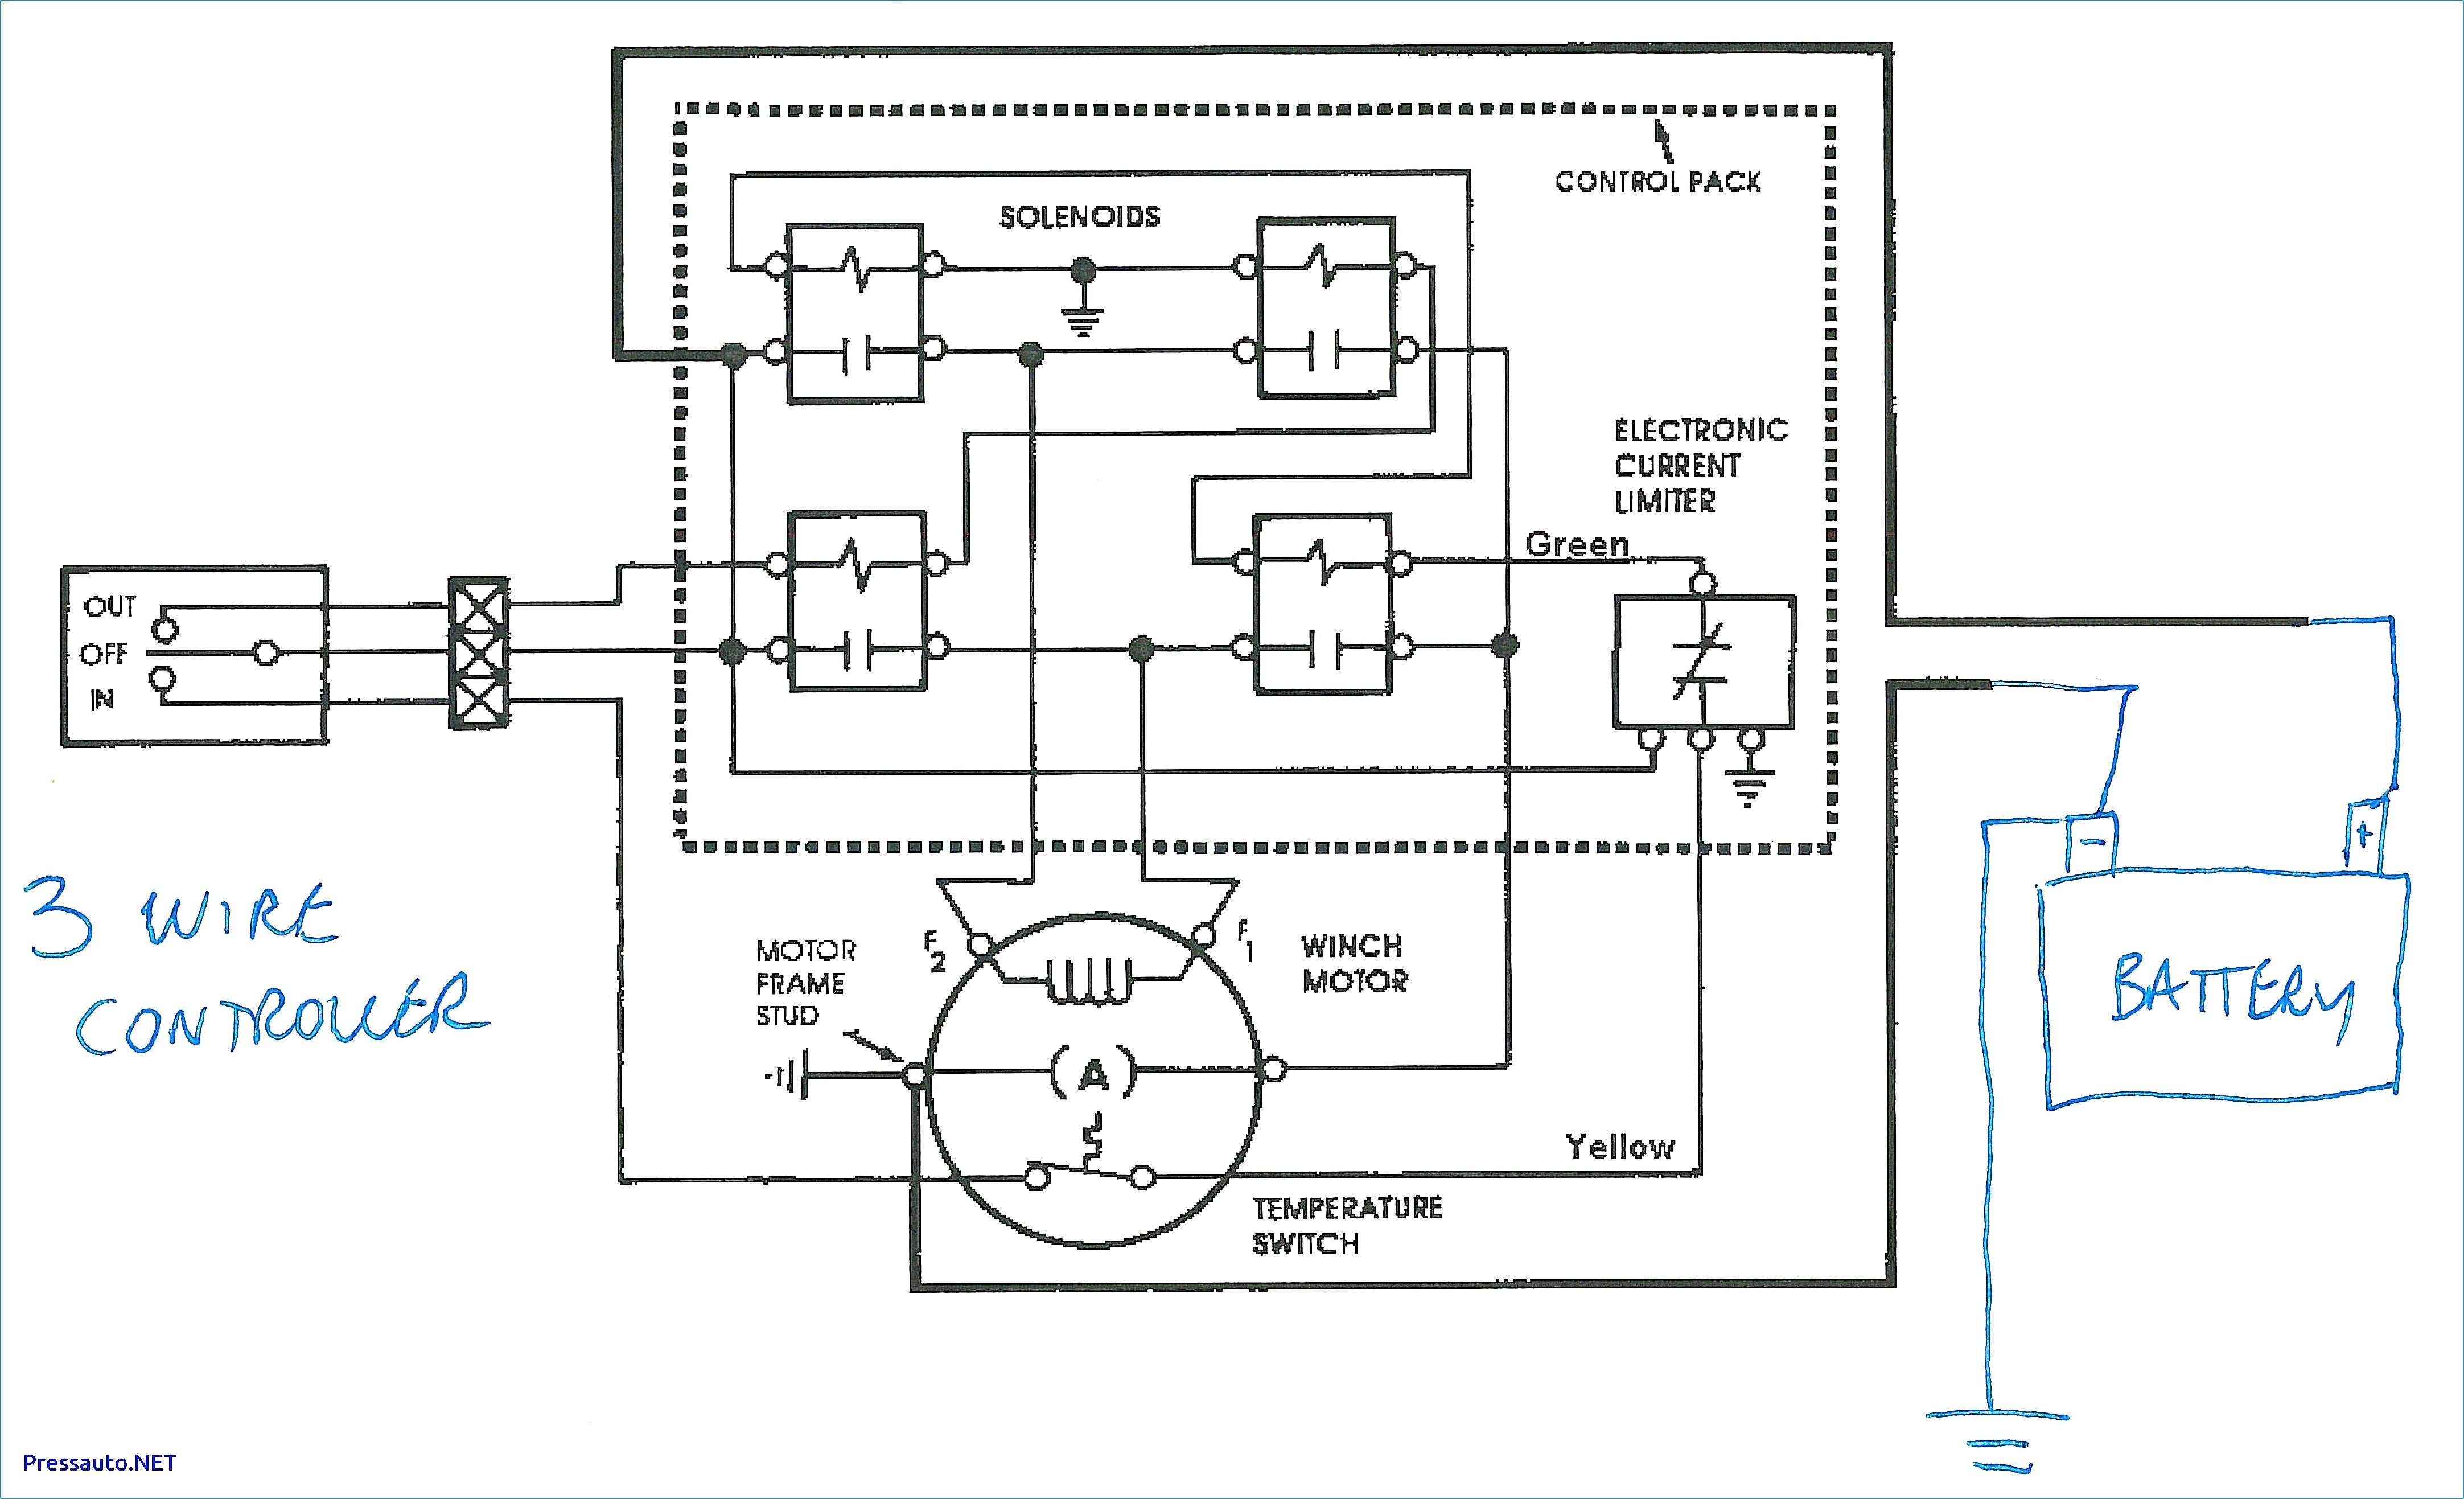 LX_6597] Warn Winch Wire Diagram 5Xps 9 Free DiagramIfica Grebs Sospe Oupli Over Benkeme Rine Umize Ponge Mohammedshrine Librar  Wiring 101